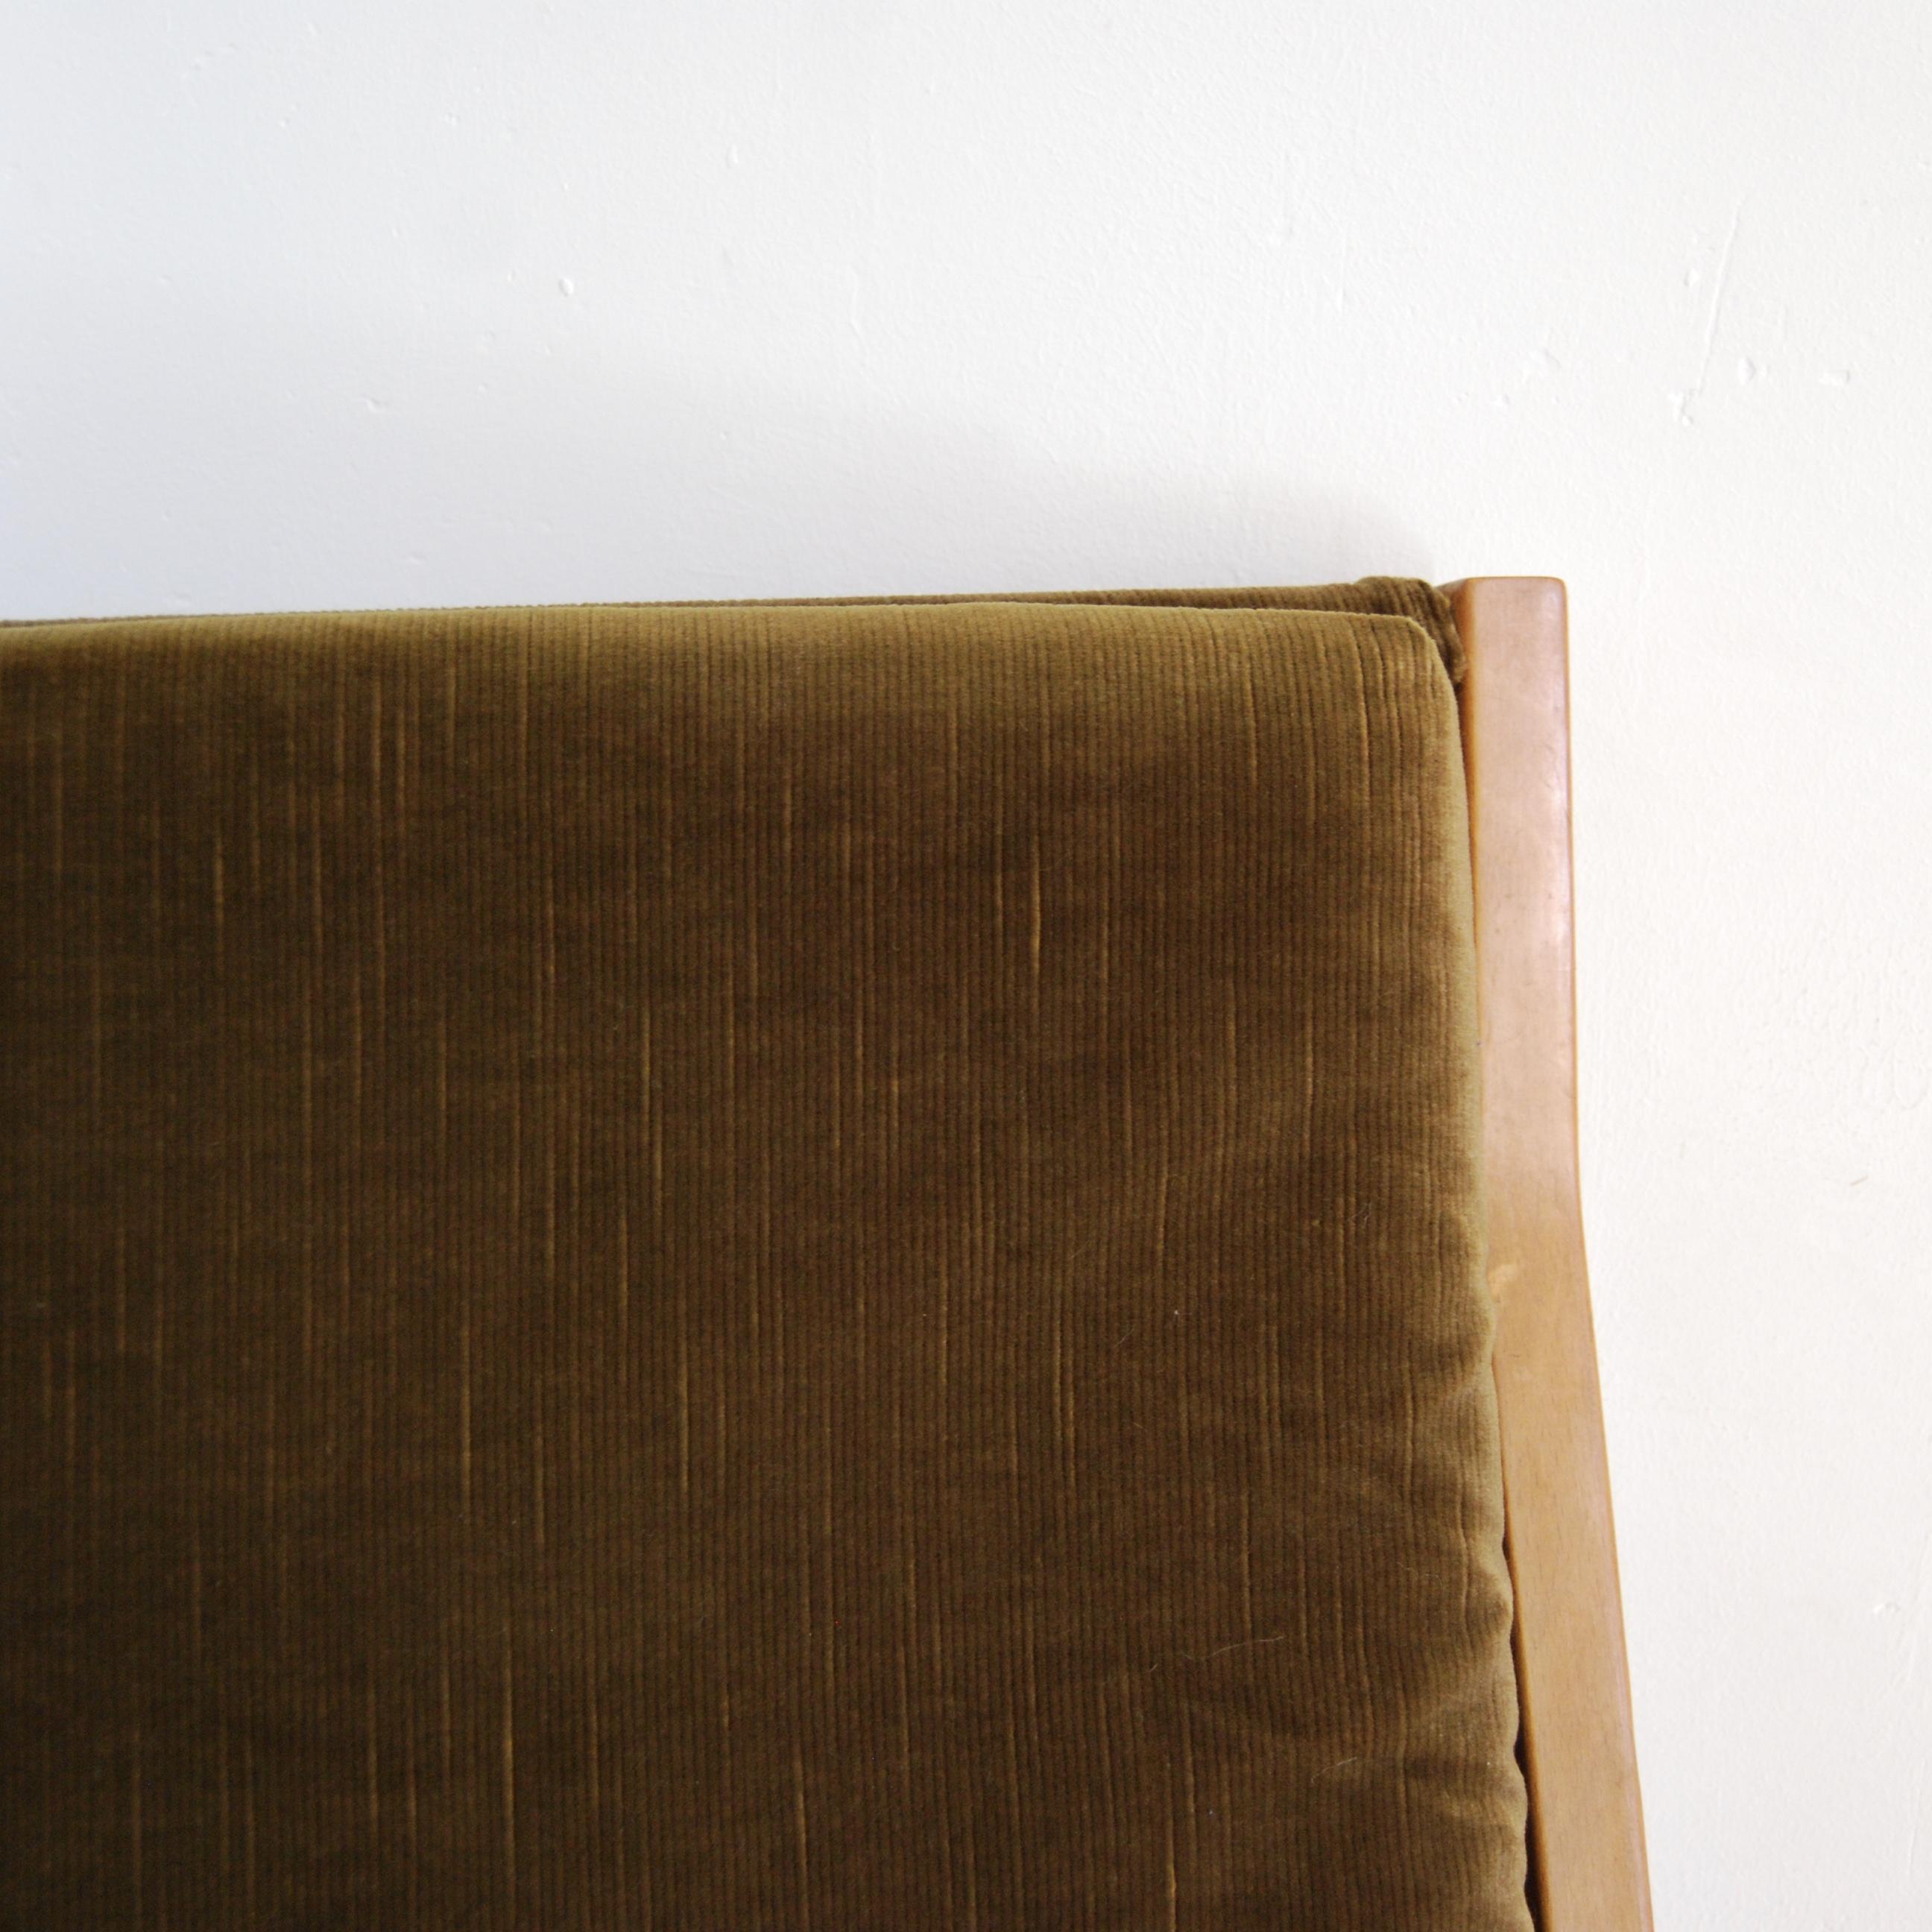 fauteuil scandinave vert kaki brocante avenue. Black Bedroom Furniture Sets. Home Design Ideas